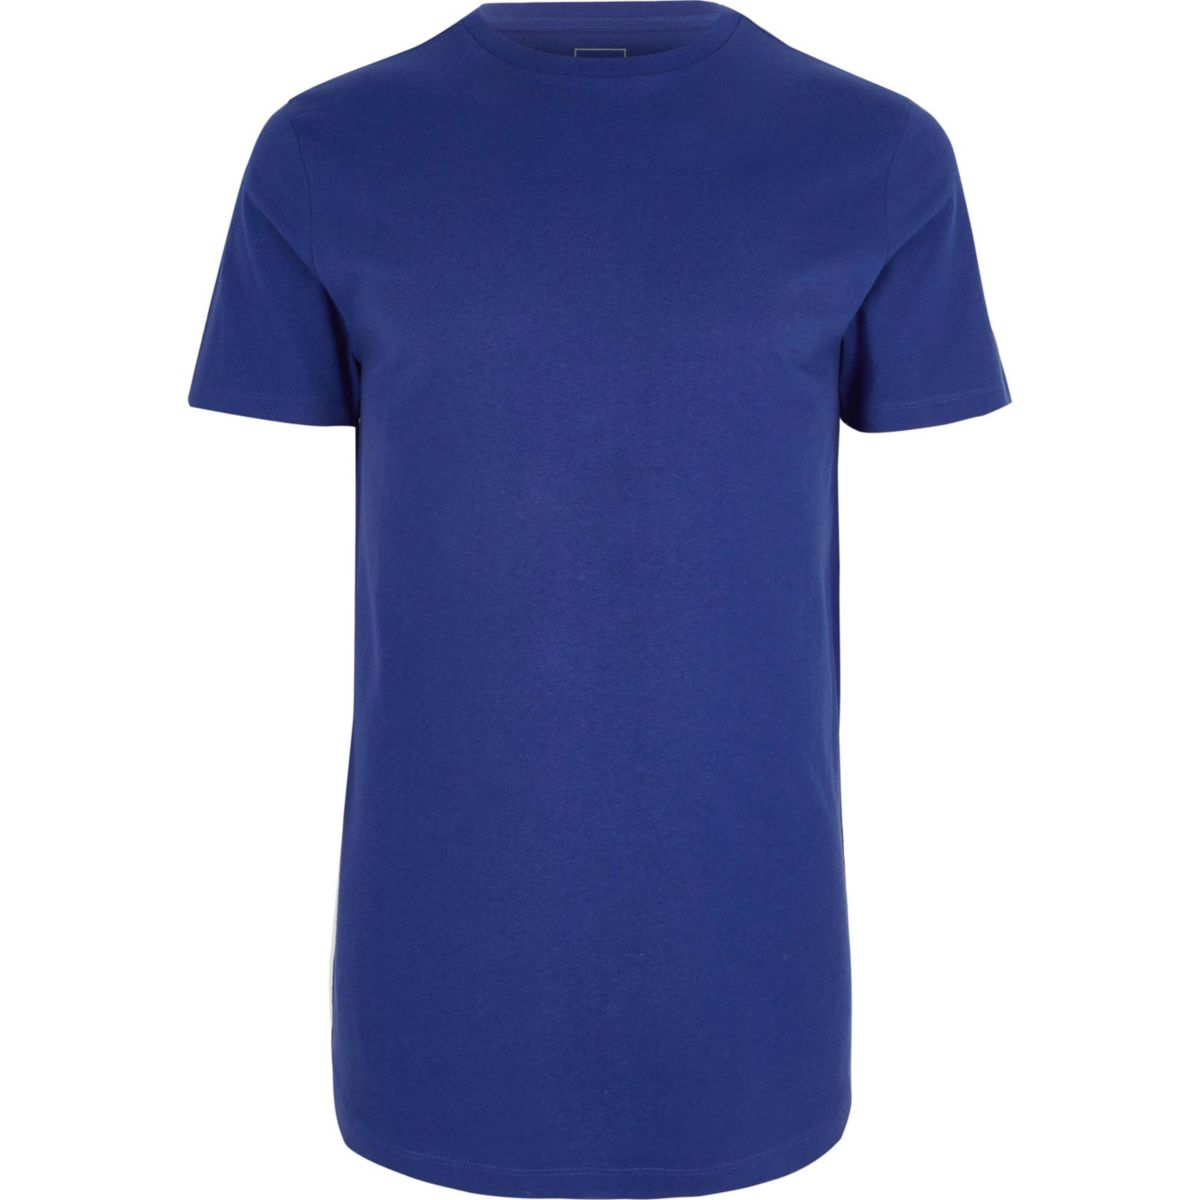 Royal blue longline crew neck T-shirt